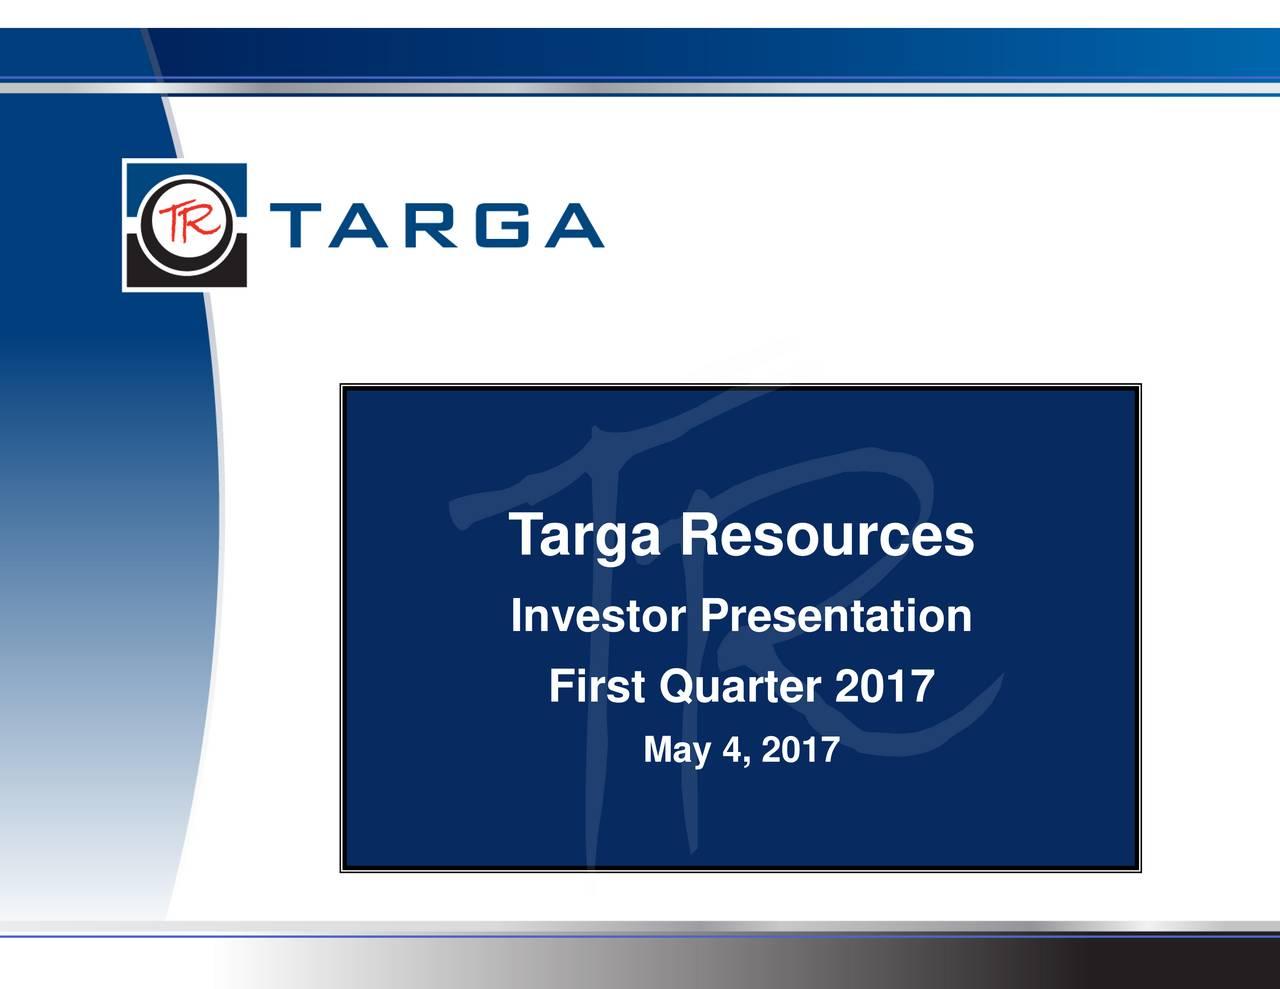 Investor Presentation First Quarter 2017 May 4, 2017